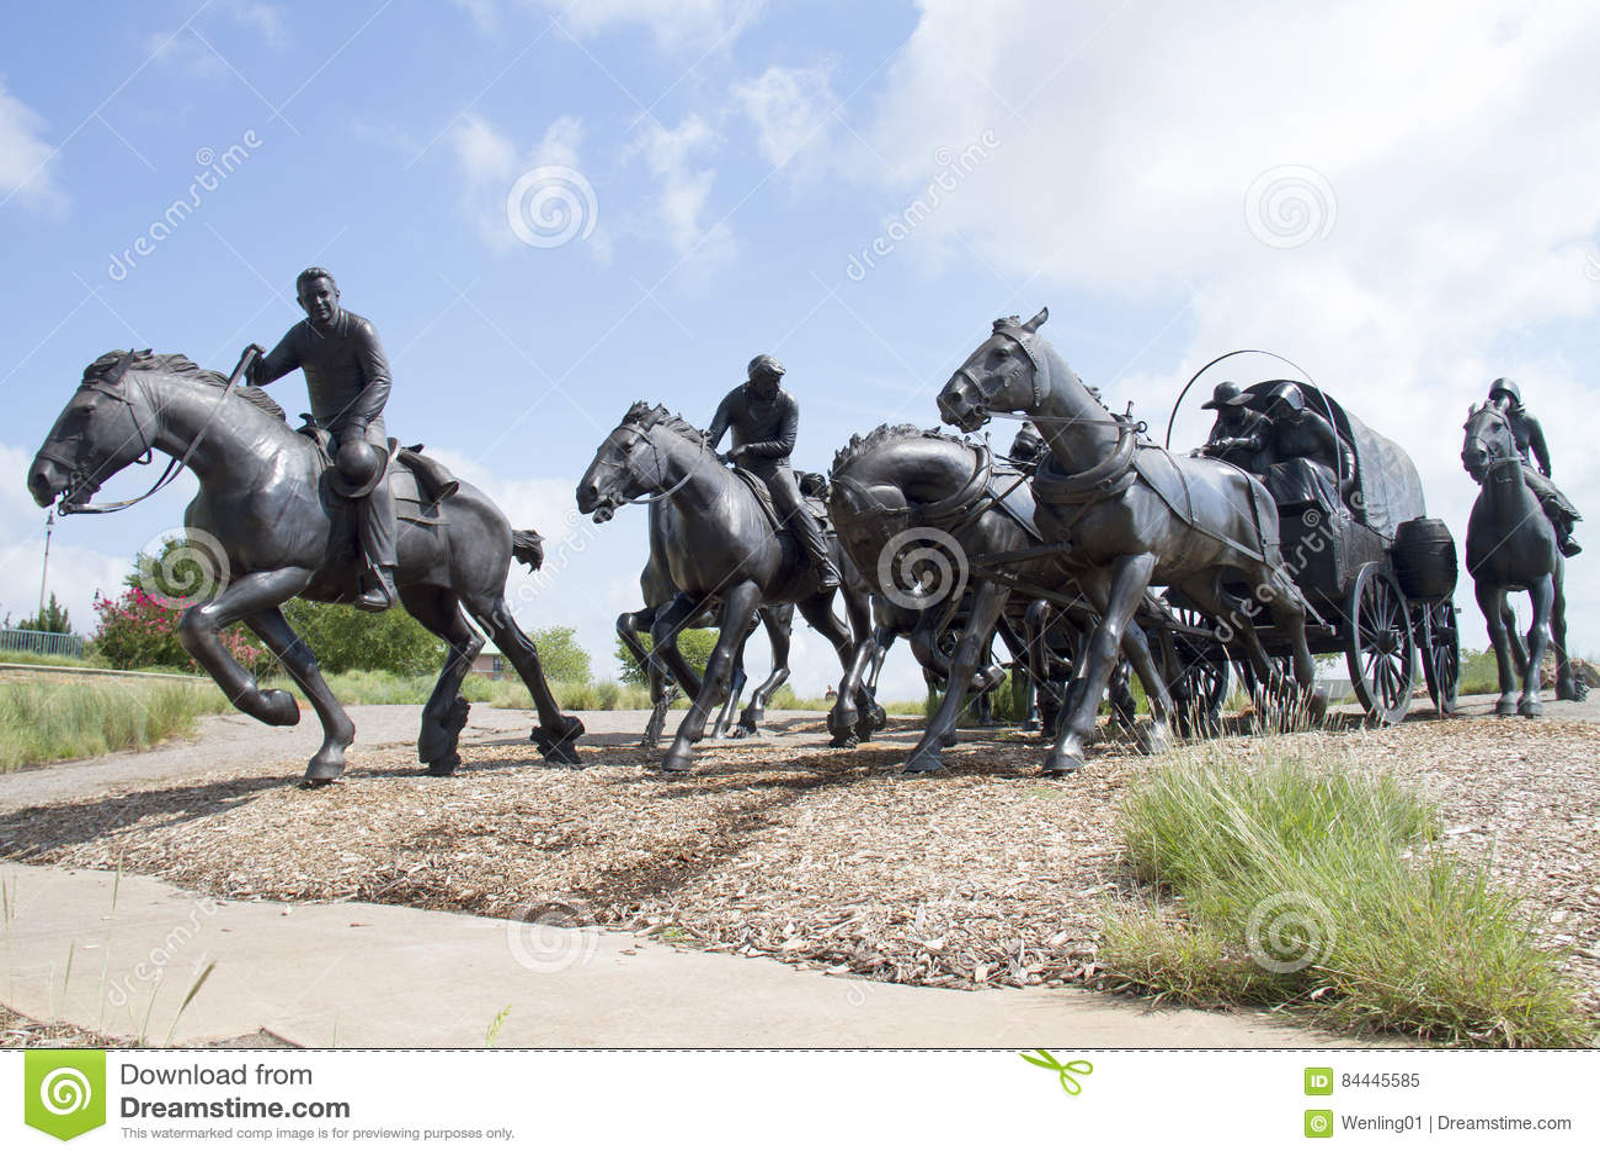 Bronze sculpture in modern city Oklahoma